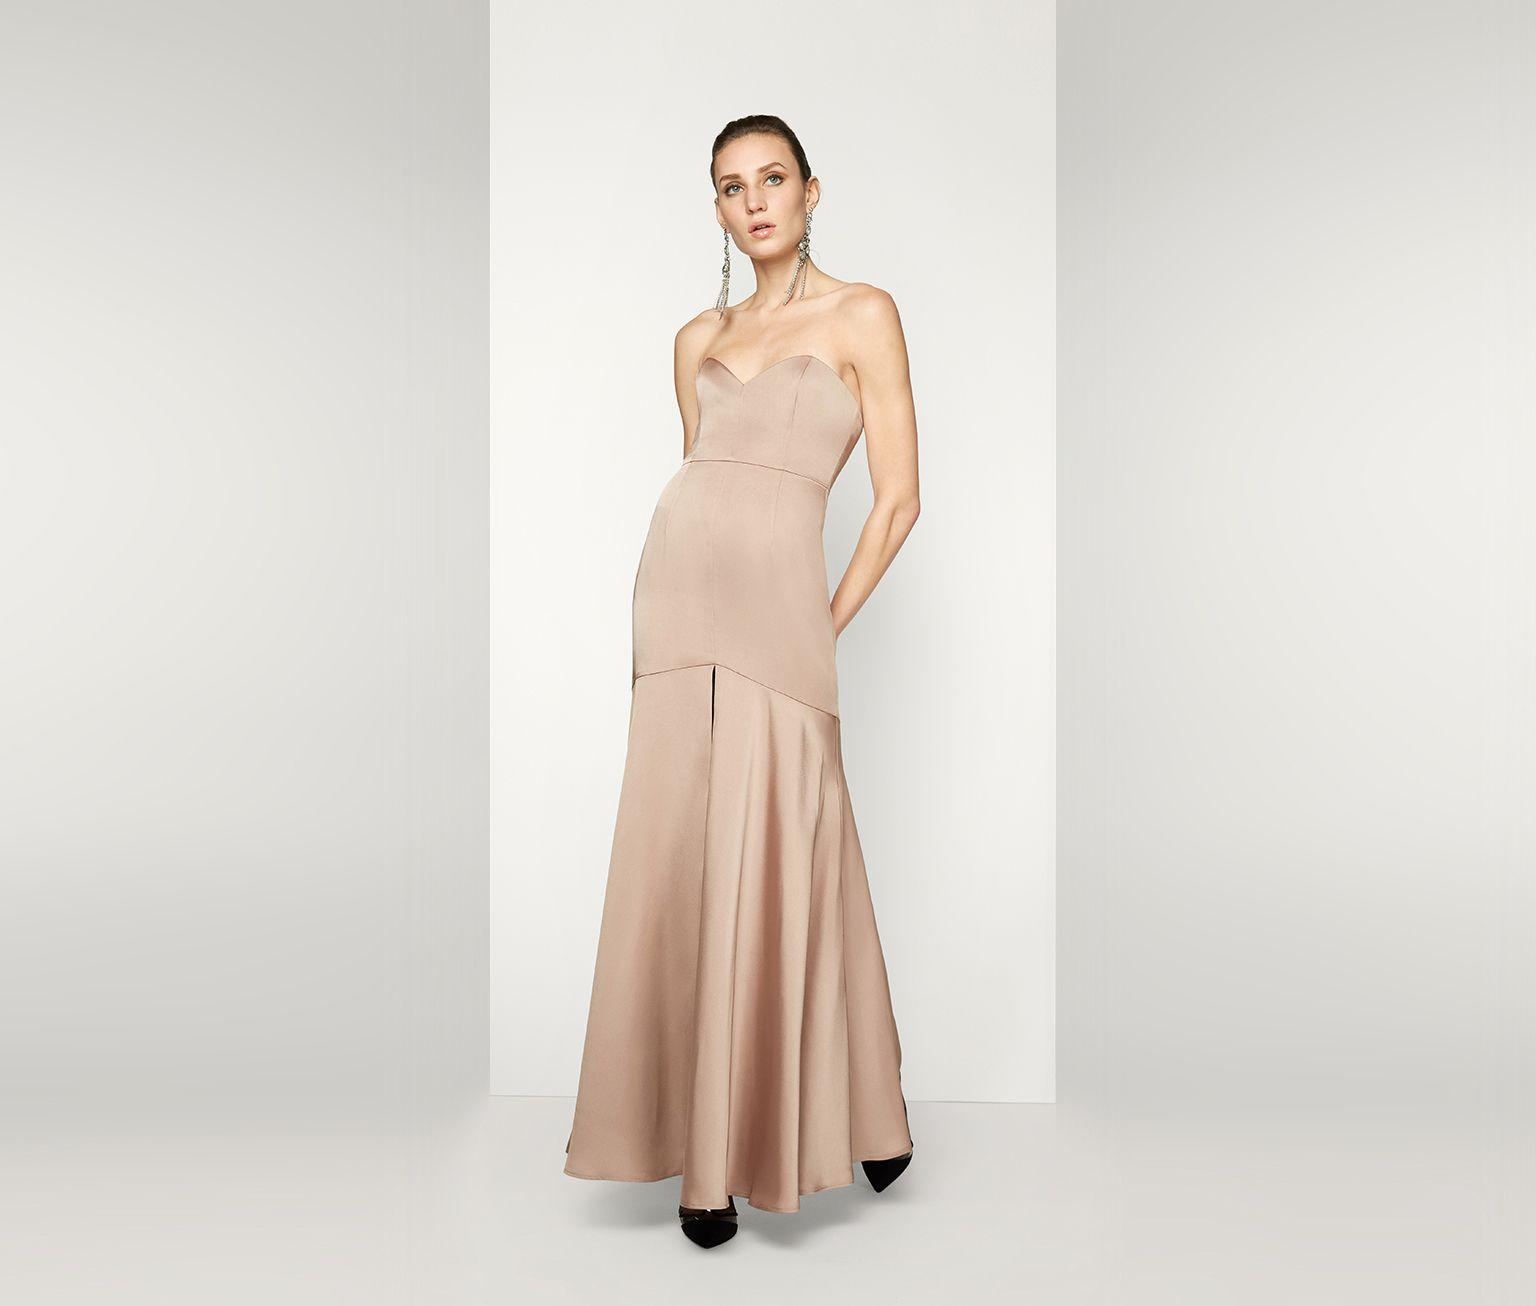 Dark Tan The Nebula Dress Fame Partners Usa Dresses Satin Evening Dresses Nebula Dress [ 1306 x 1536 Pixel ]